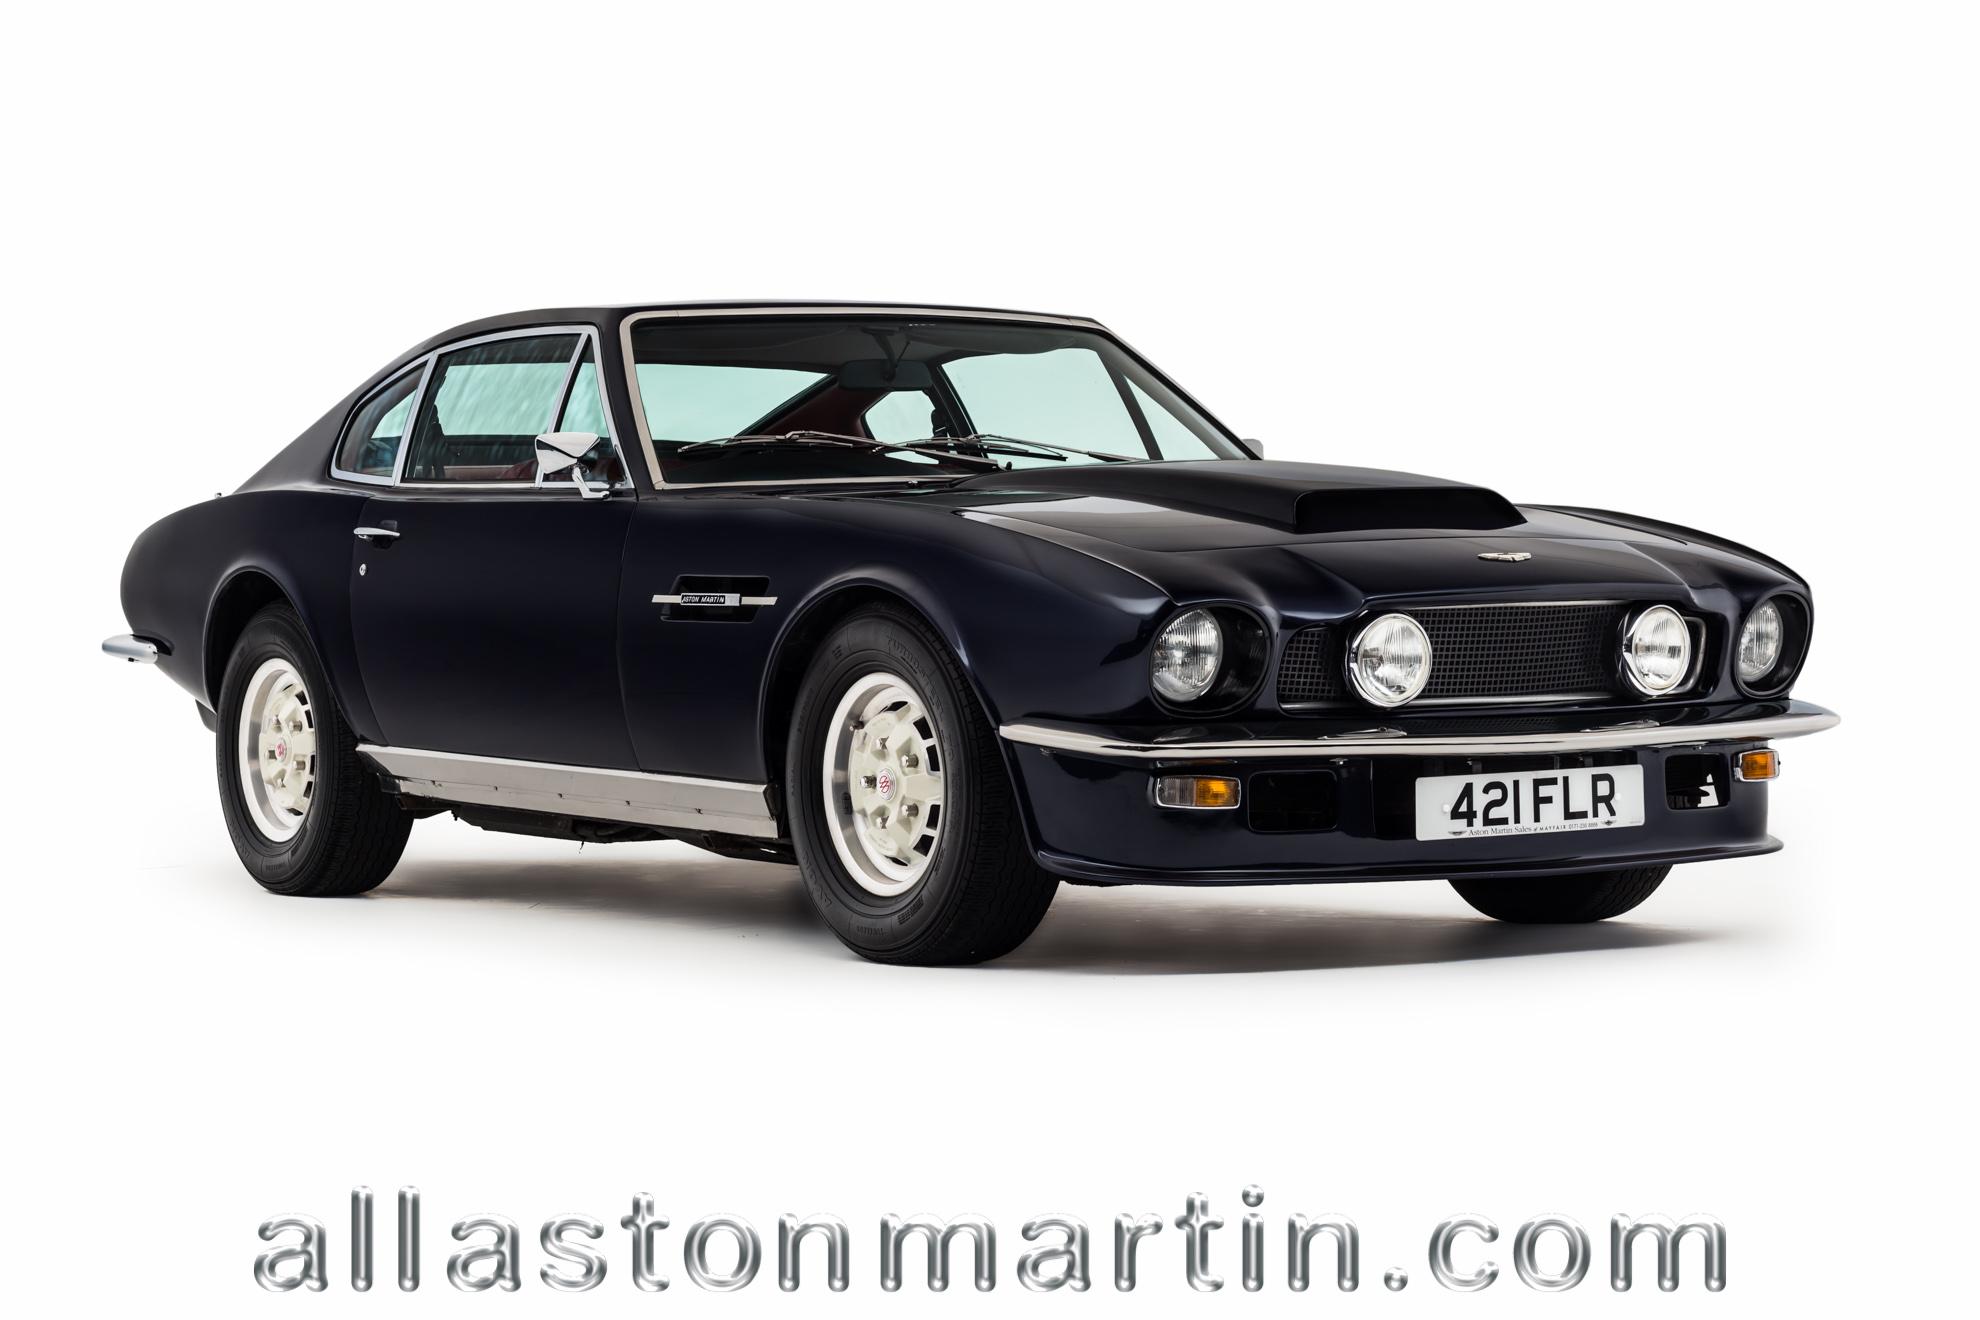 Aston Martin Cars For Sale - Buy Aston Martin - Details - All ...